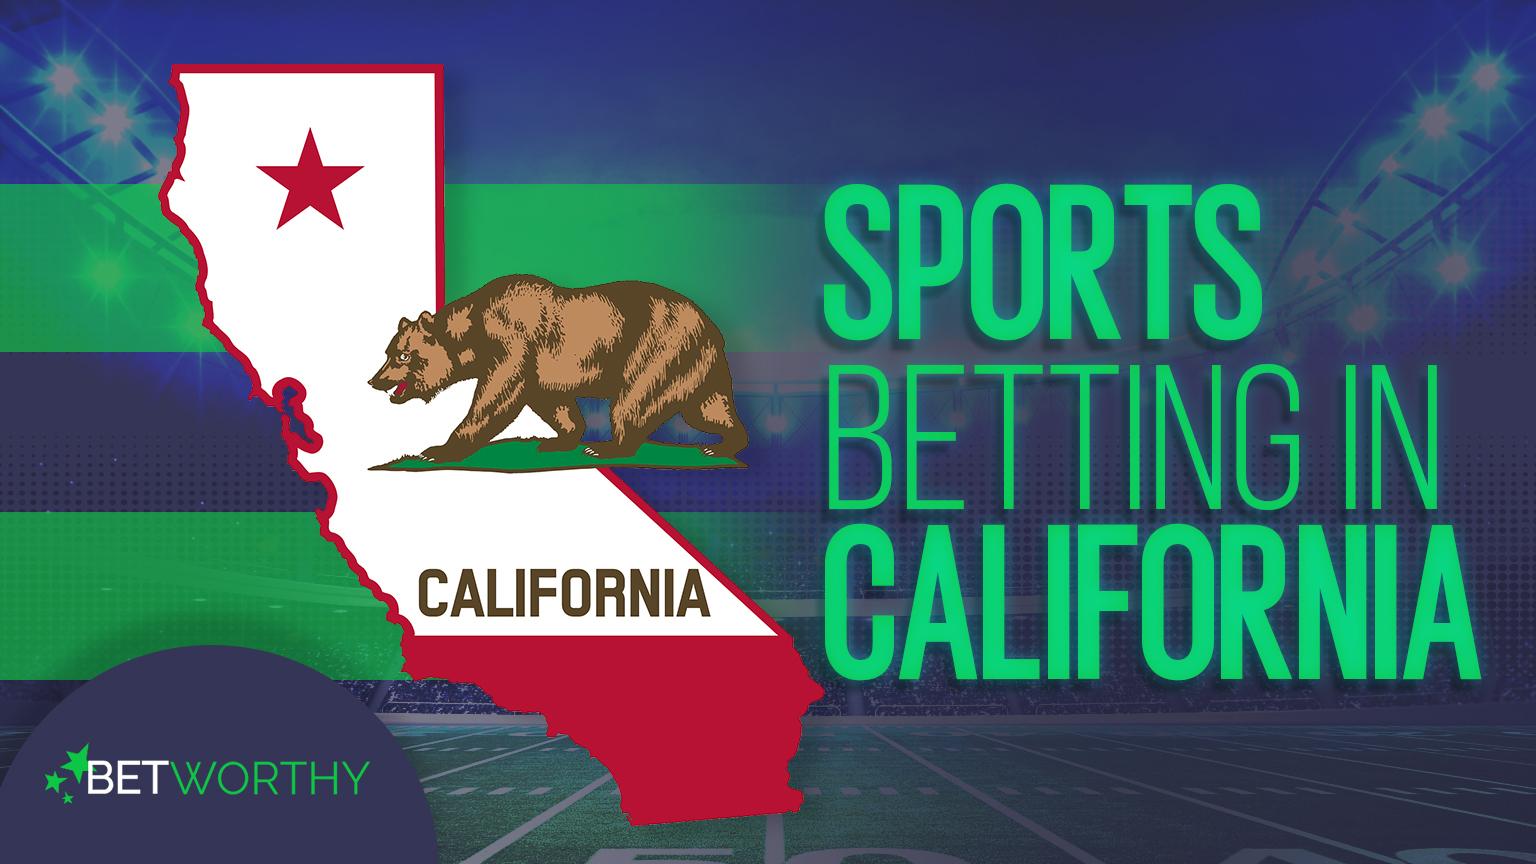 California sports betting CA